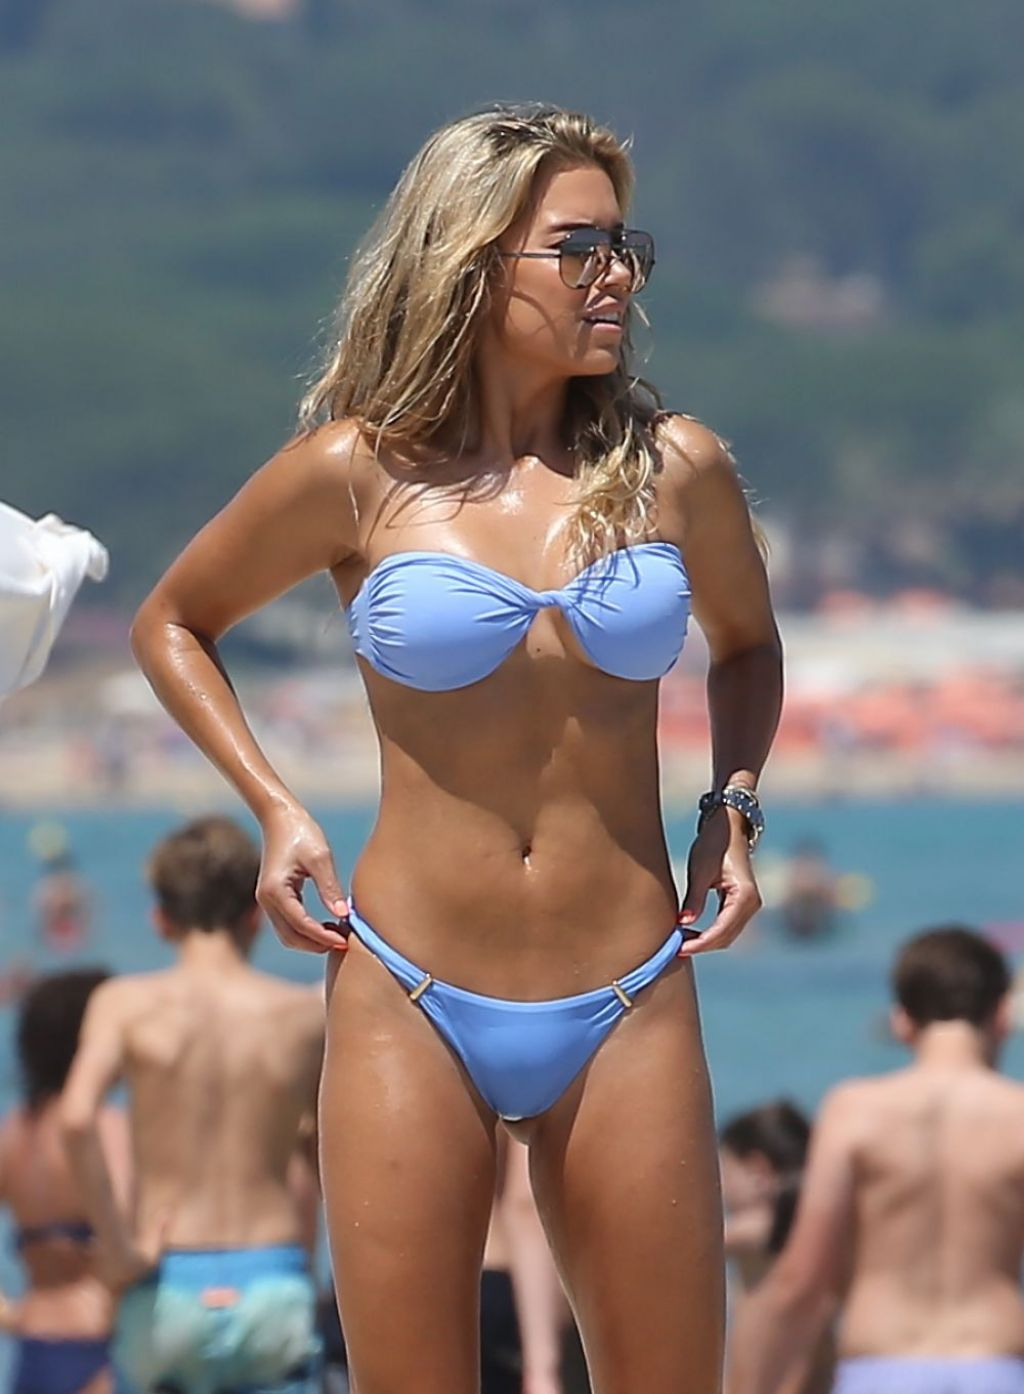 Sylvie Meis Bikini Candids St Tropez July 2016